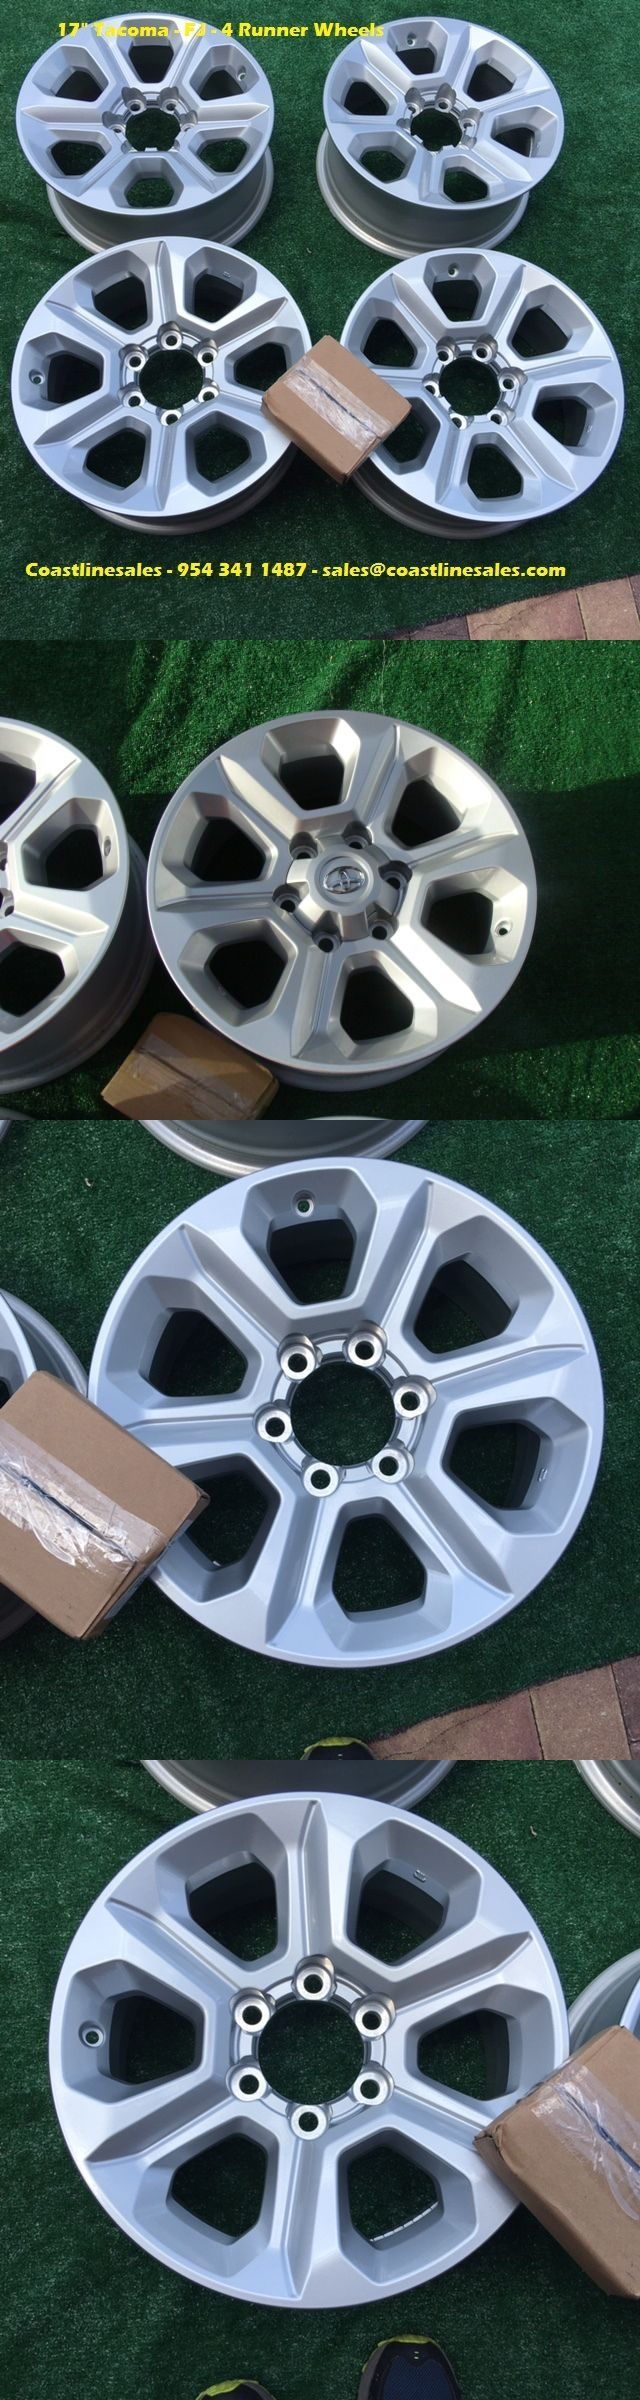 Auto parts general 17 toyota 4 runner tacoma fj factory oem wheels